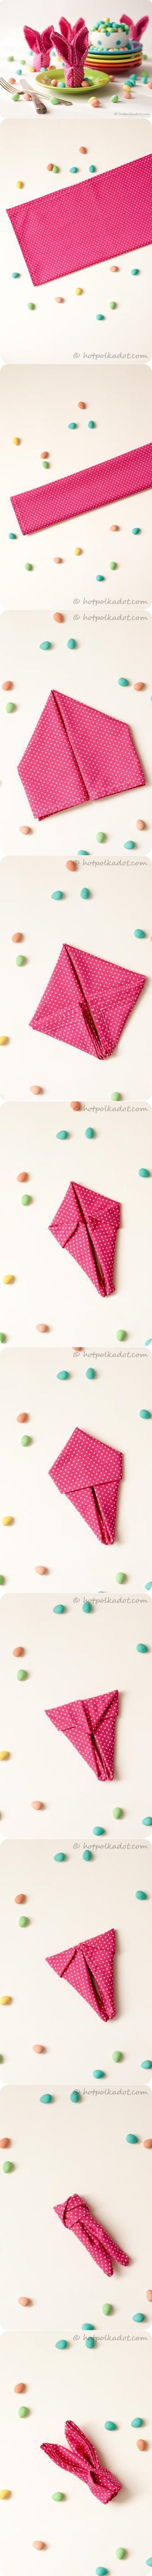 Bunny napkin folding tutorial